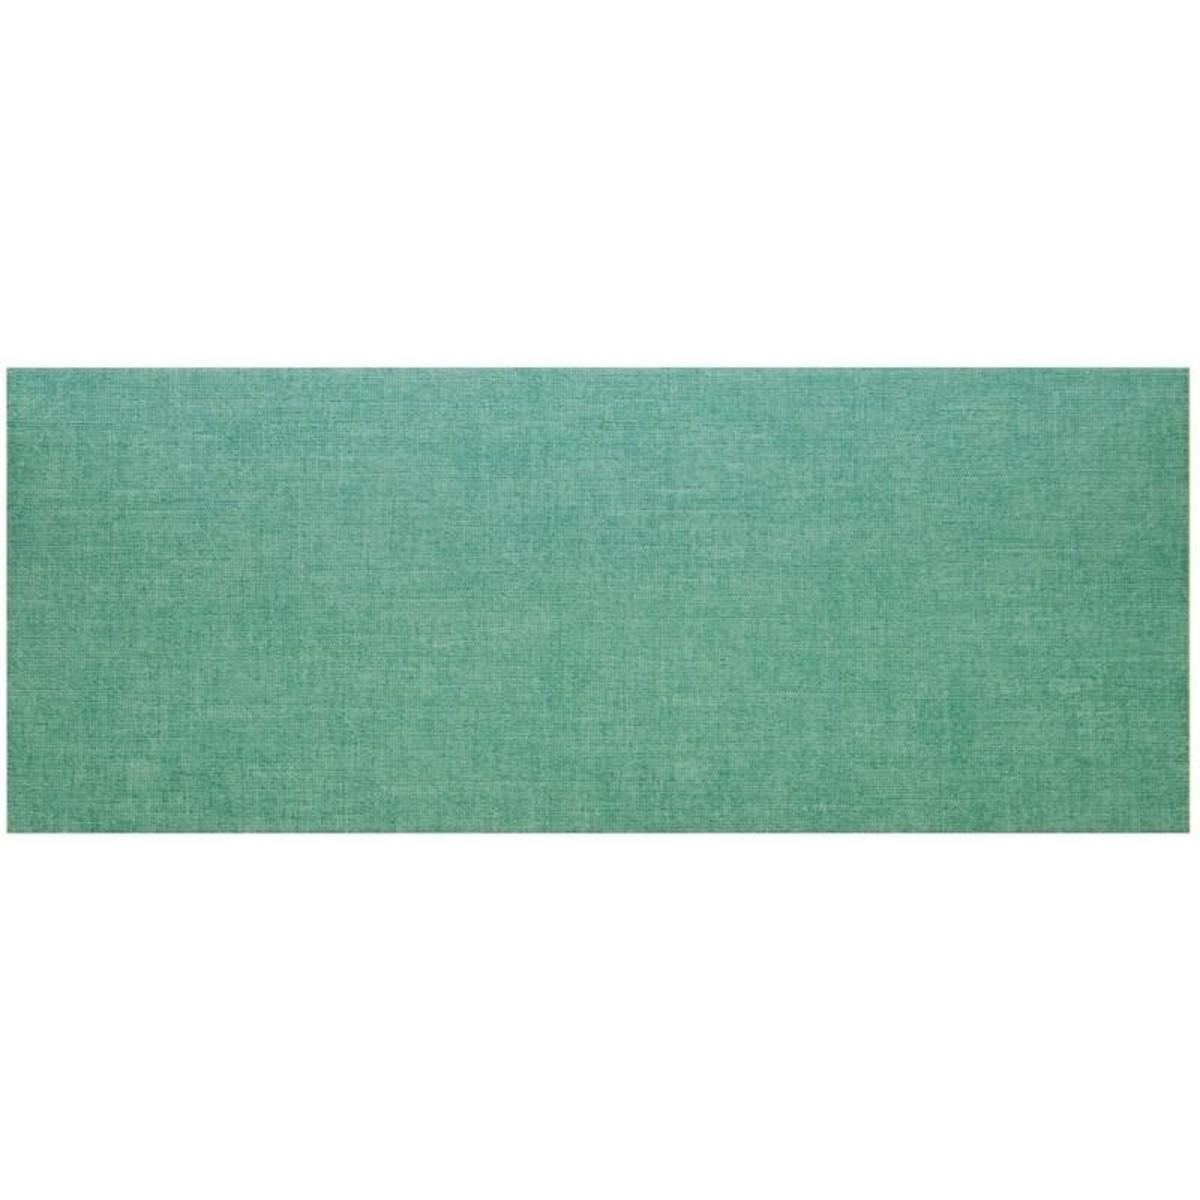 Плитка настенная Пленэр 20х50 см 1 м2 цвет зеленый